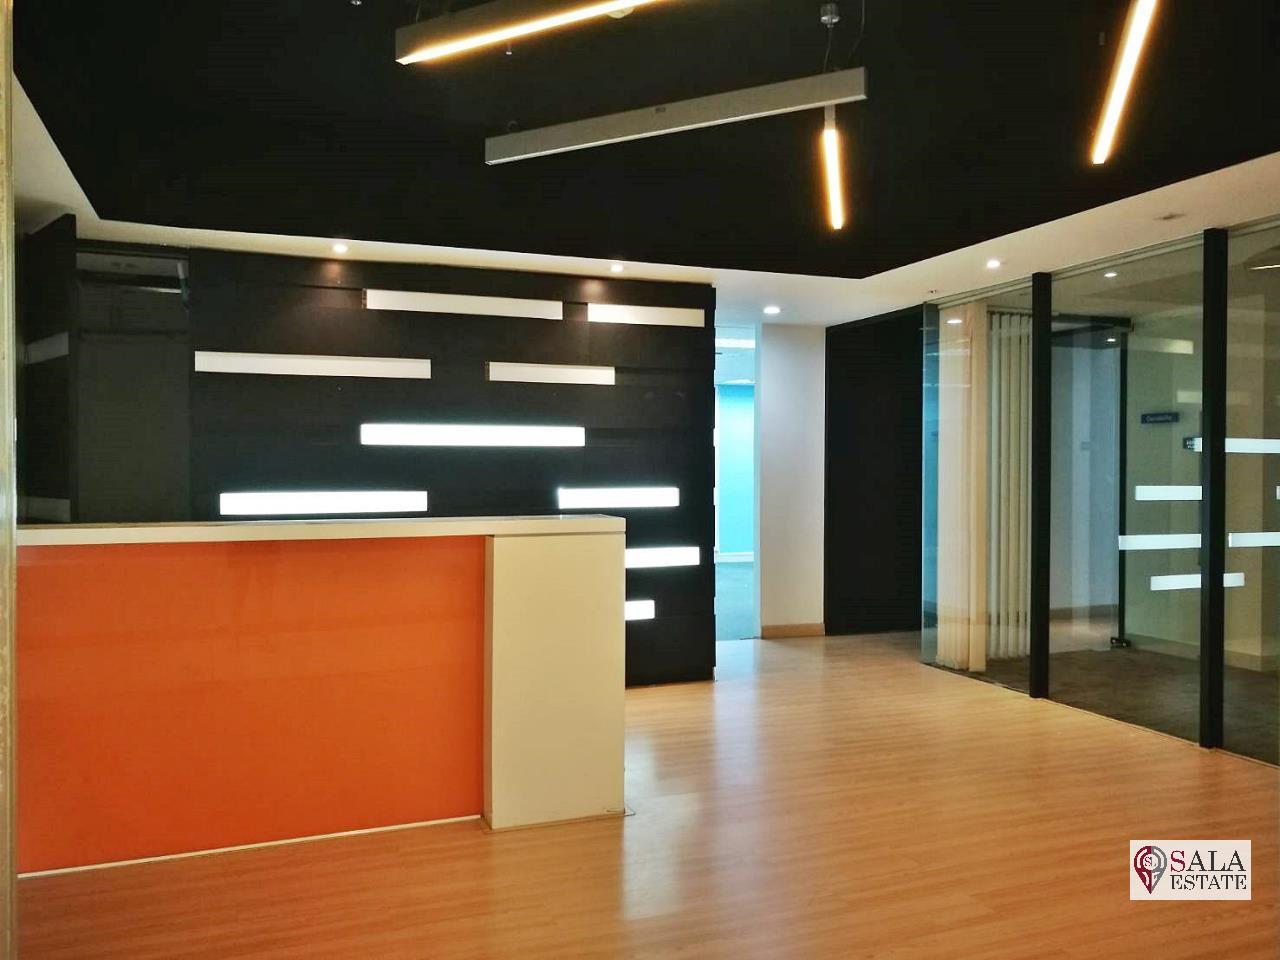 SALA ESTATE Agency's OFFICE SPACE AT SUKHUMVIT 13 - BTS NANA - TERMINAL 21 1